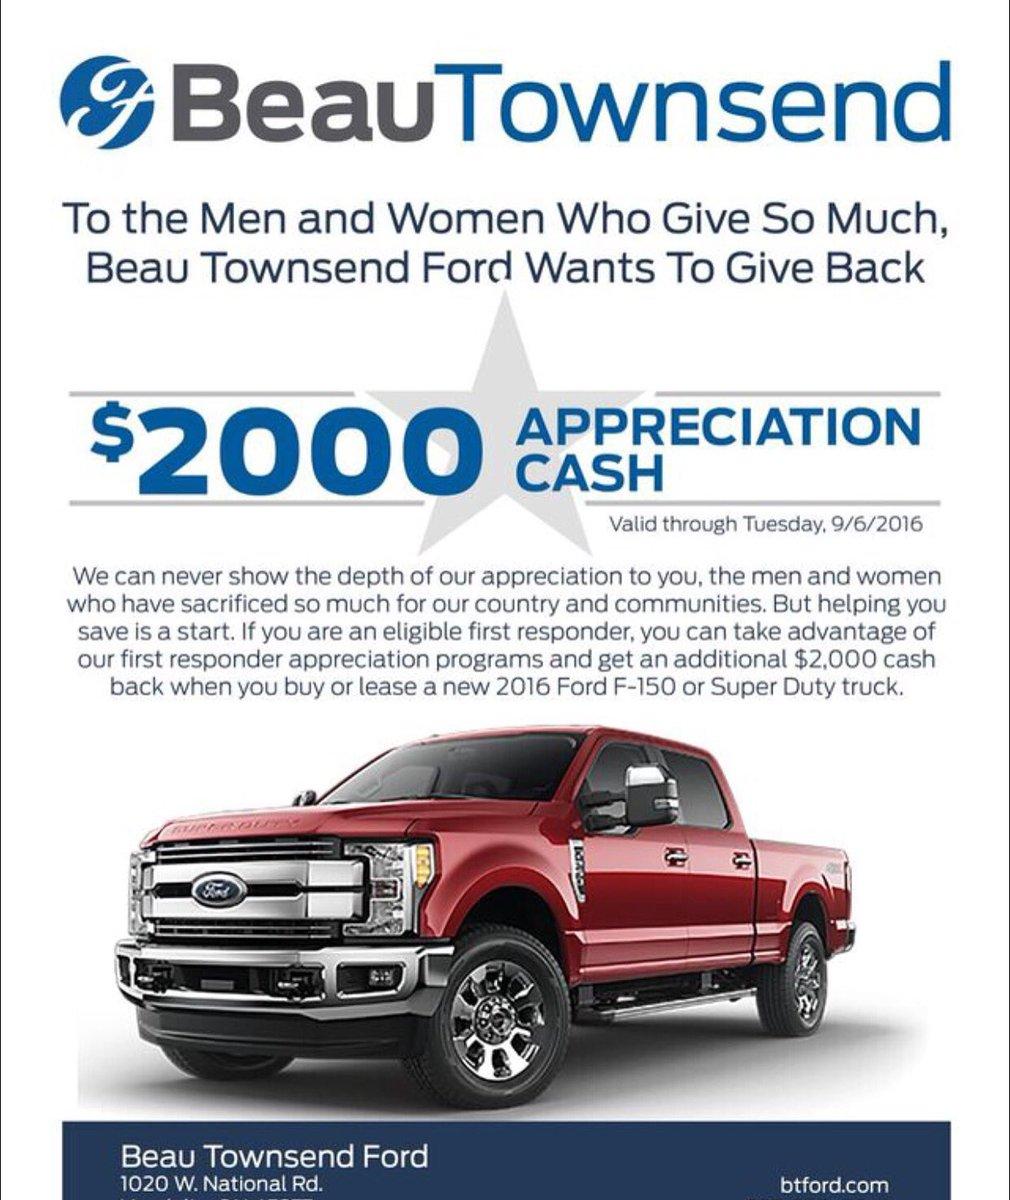 Beau Townsend Ford >> Beau Townsend Ford Btforddotcom Twitter